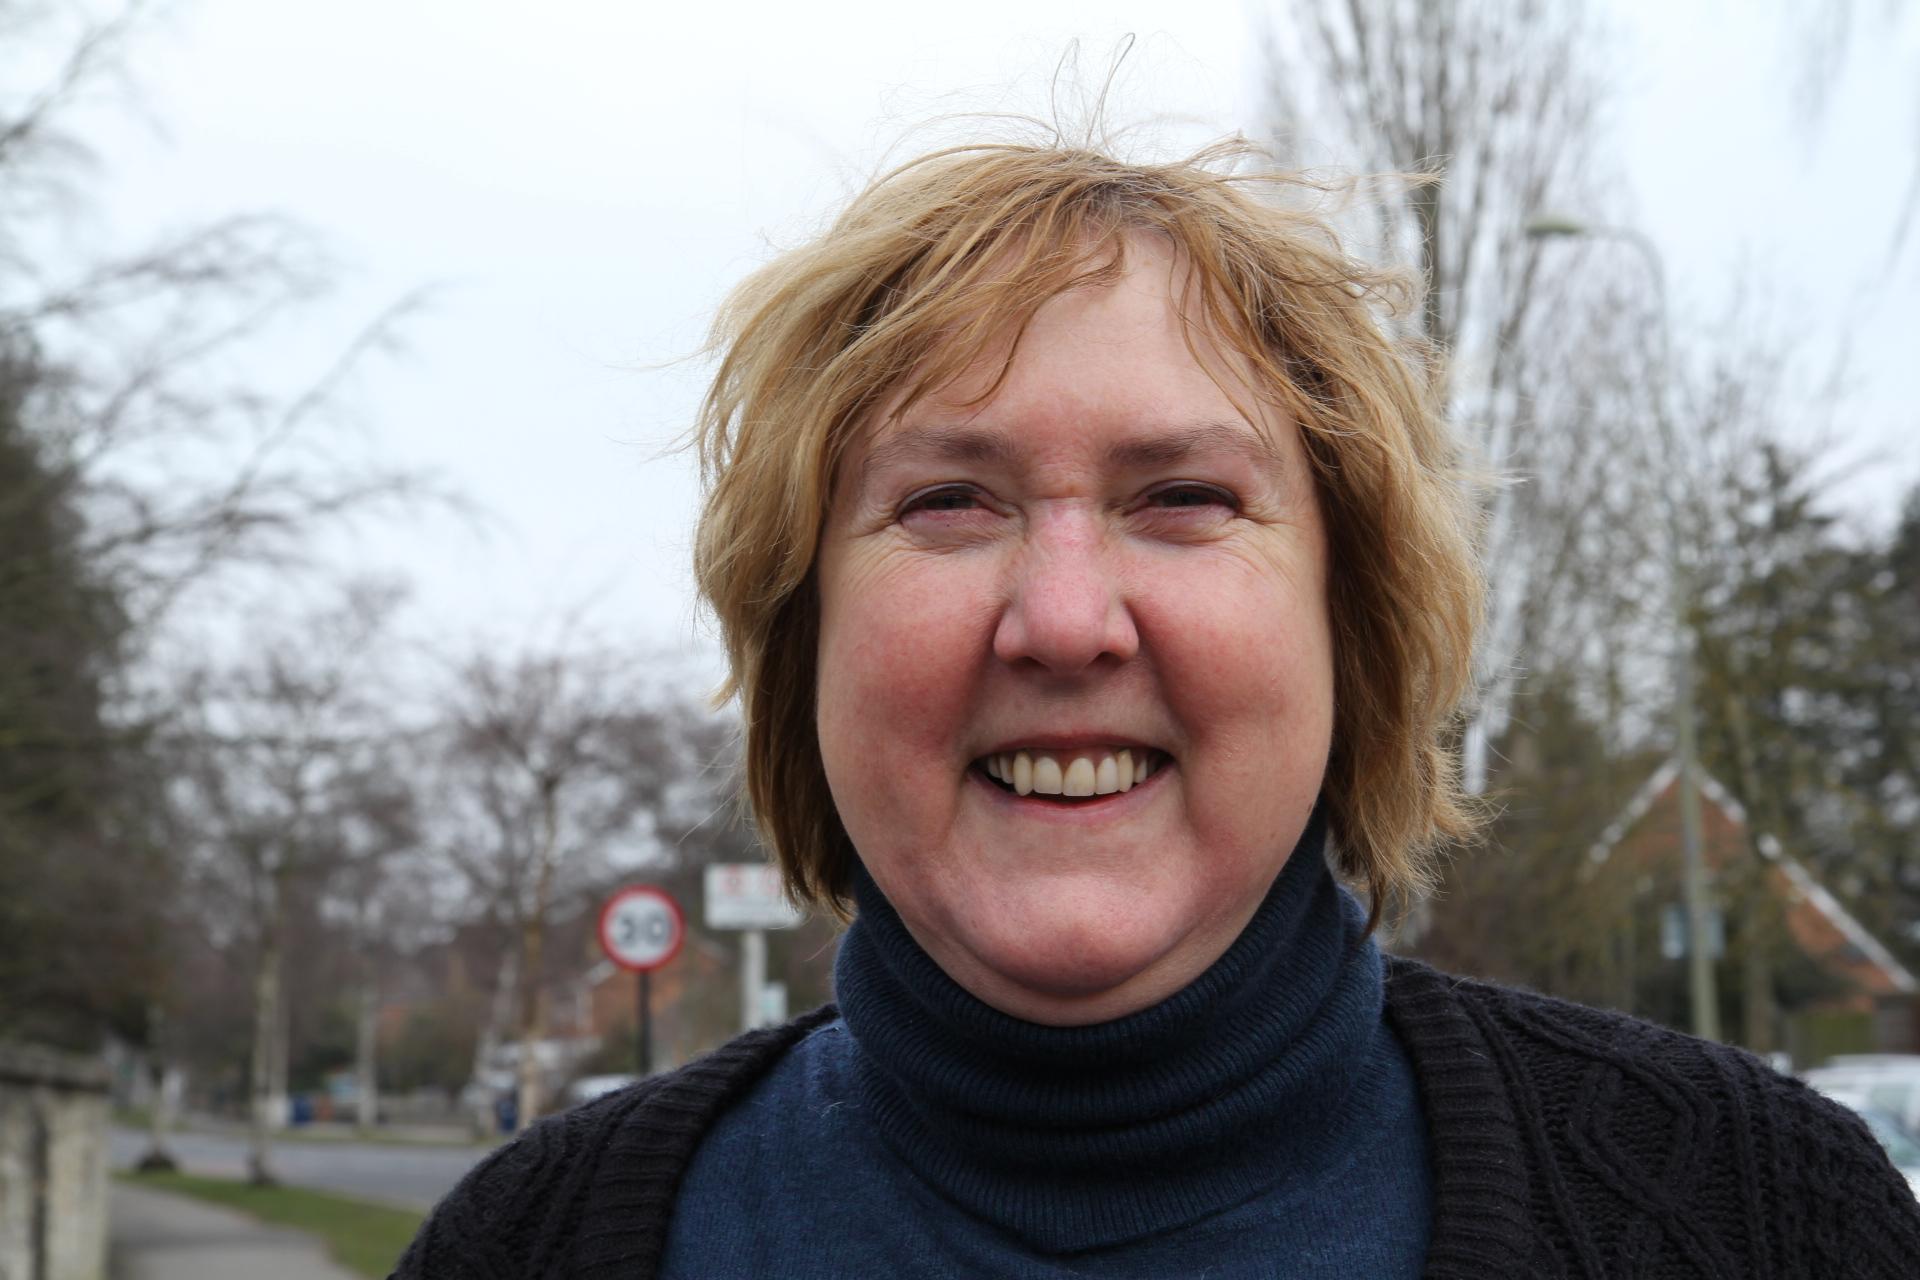 Headington councillor Ruth Wilkinson has stood down for family reasons